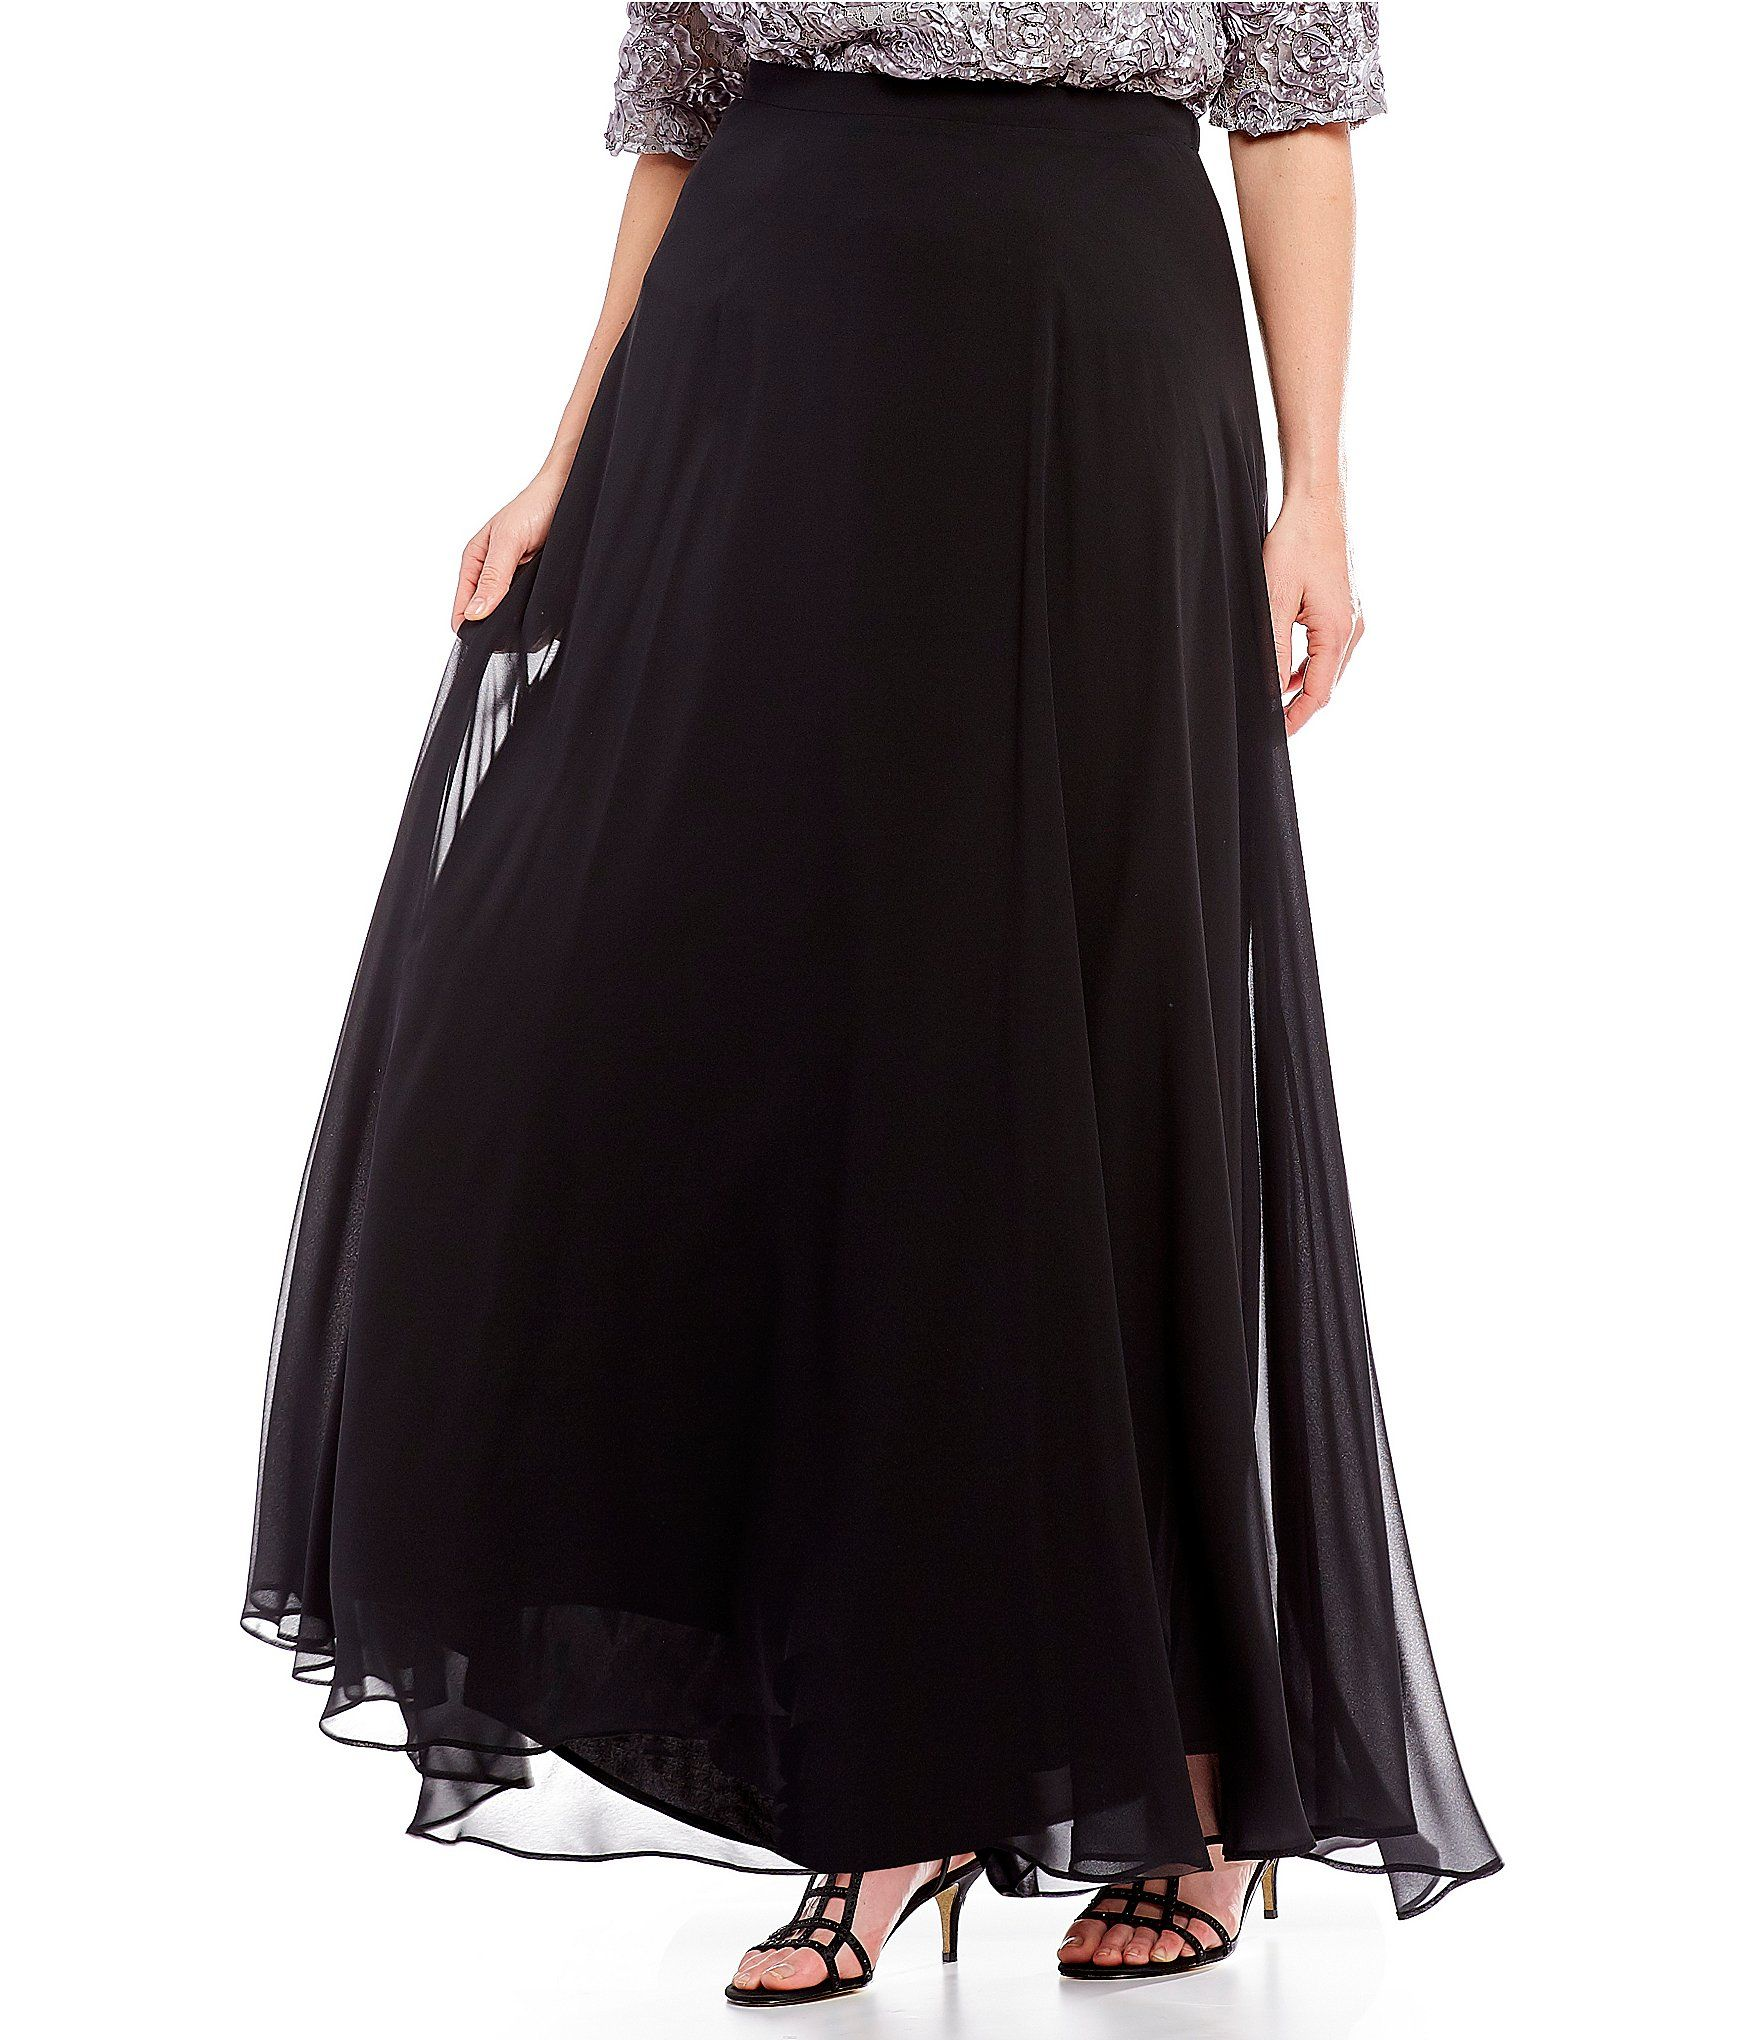 e4c212528f Long Formal Skirts Dillards | Saddha